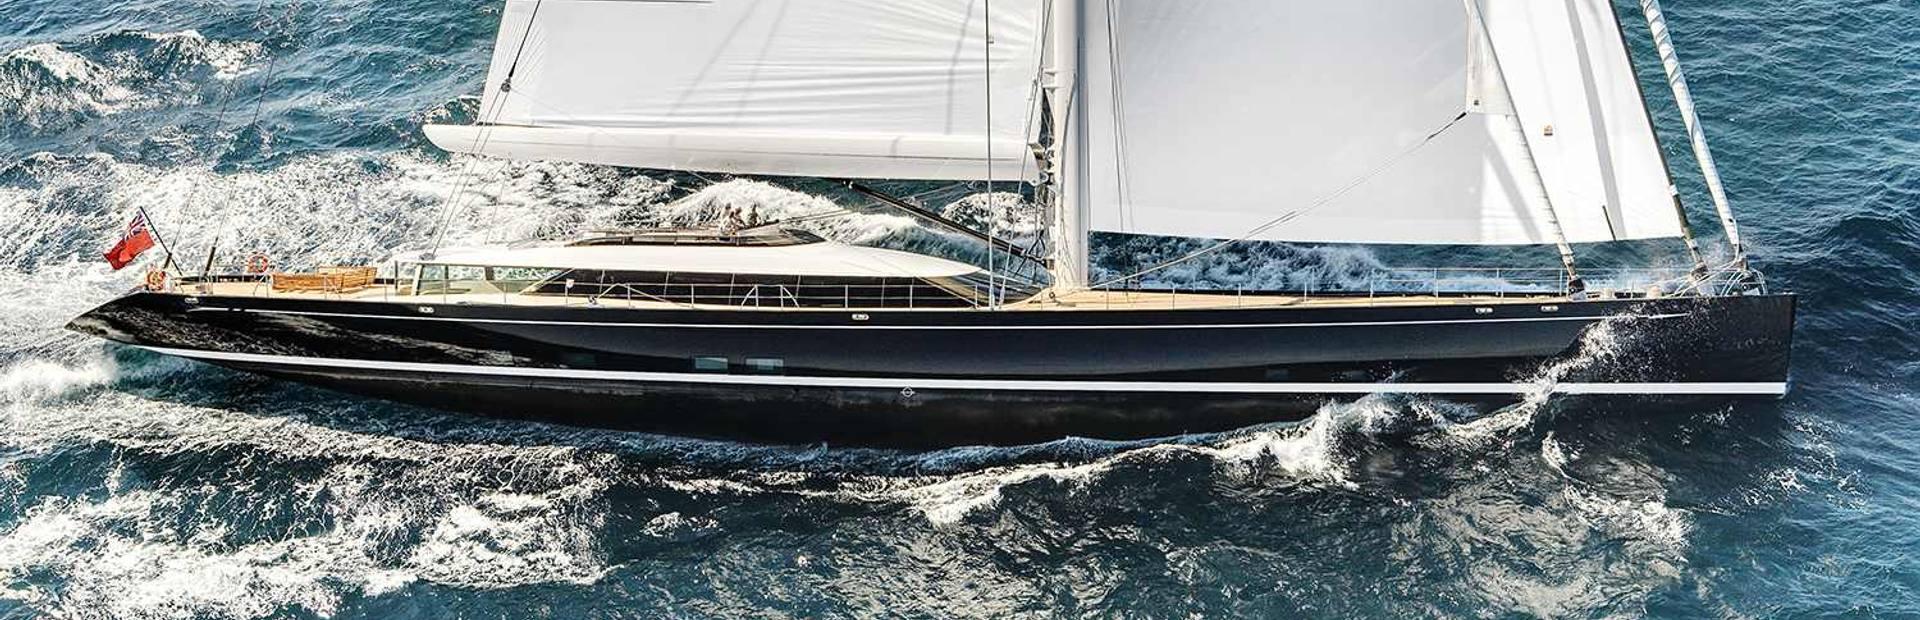 Kokomo superyacht built by Alloy Yachts